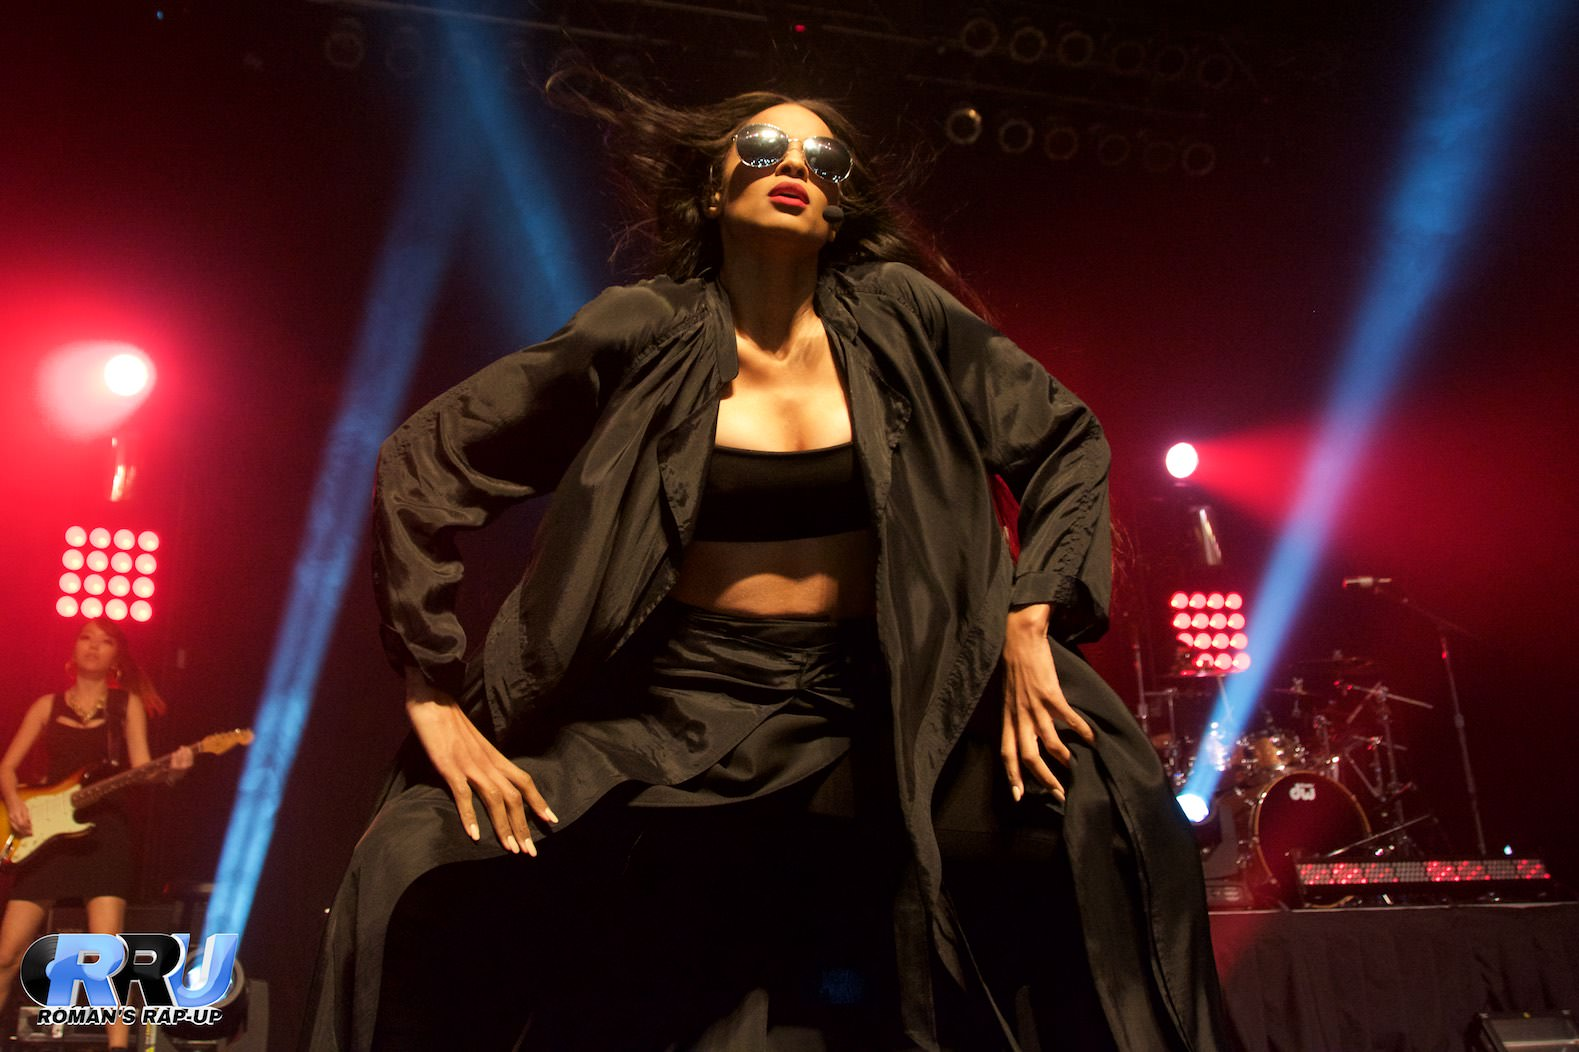 Ciara performs in Boston, MA on May 7th, 2015 (Benjamin Esakof/Roman's Rap-Up).